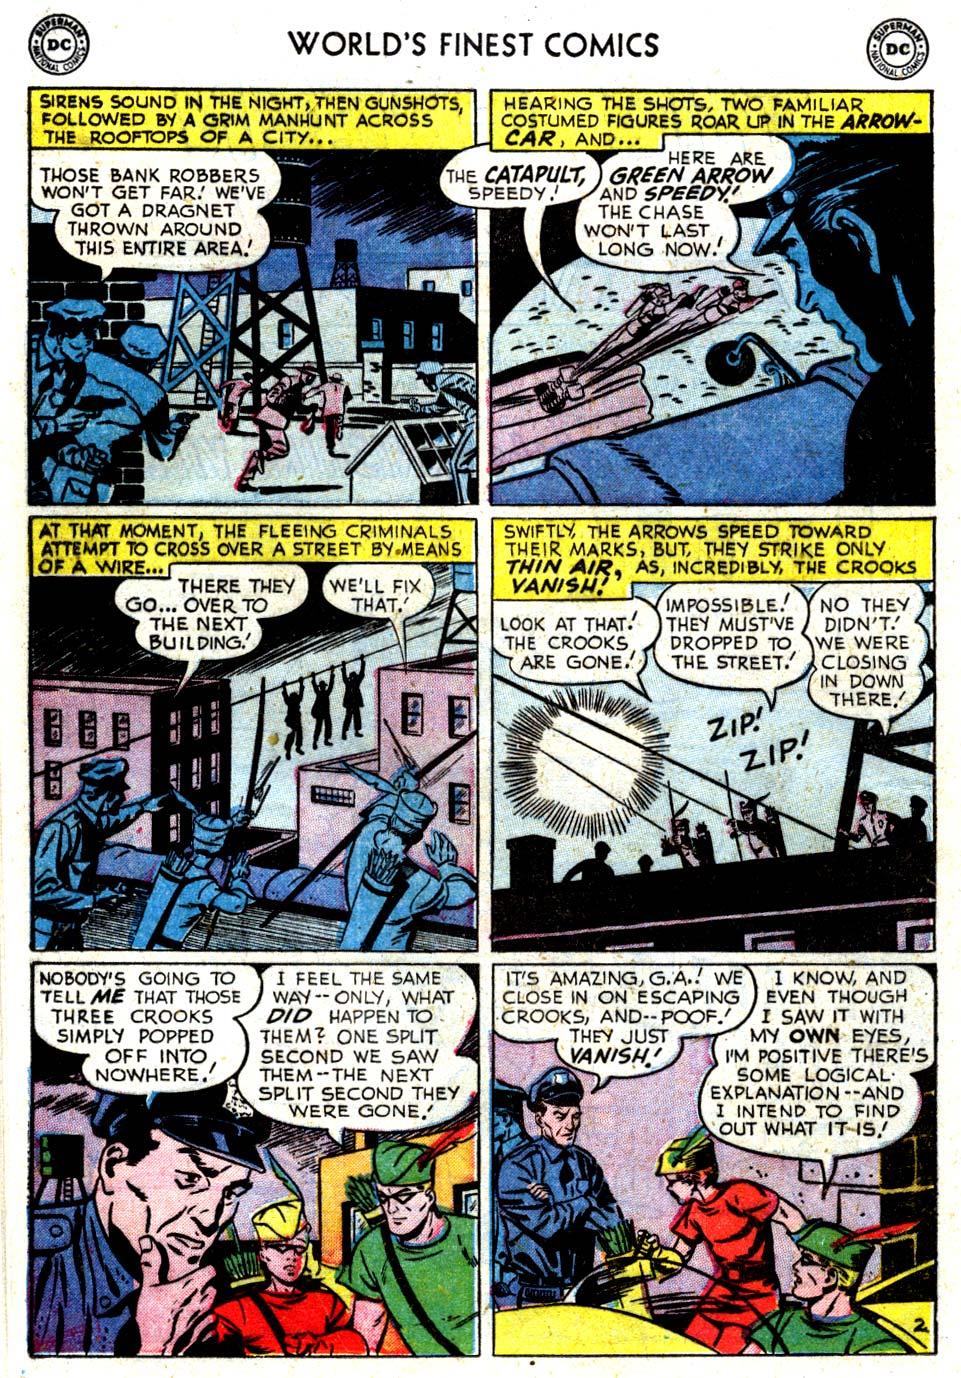 Read online World's Finest Comics comic -  Issue #68 - 28